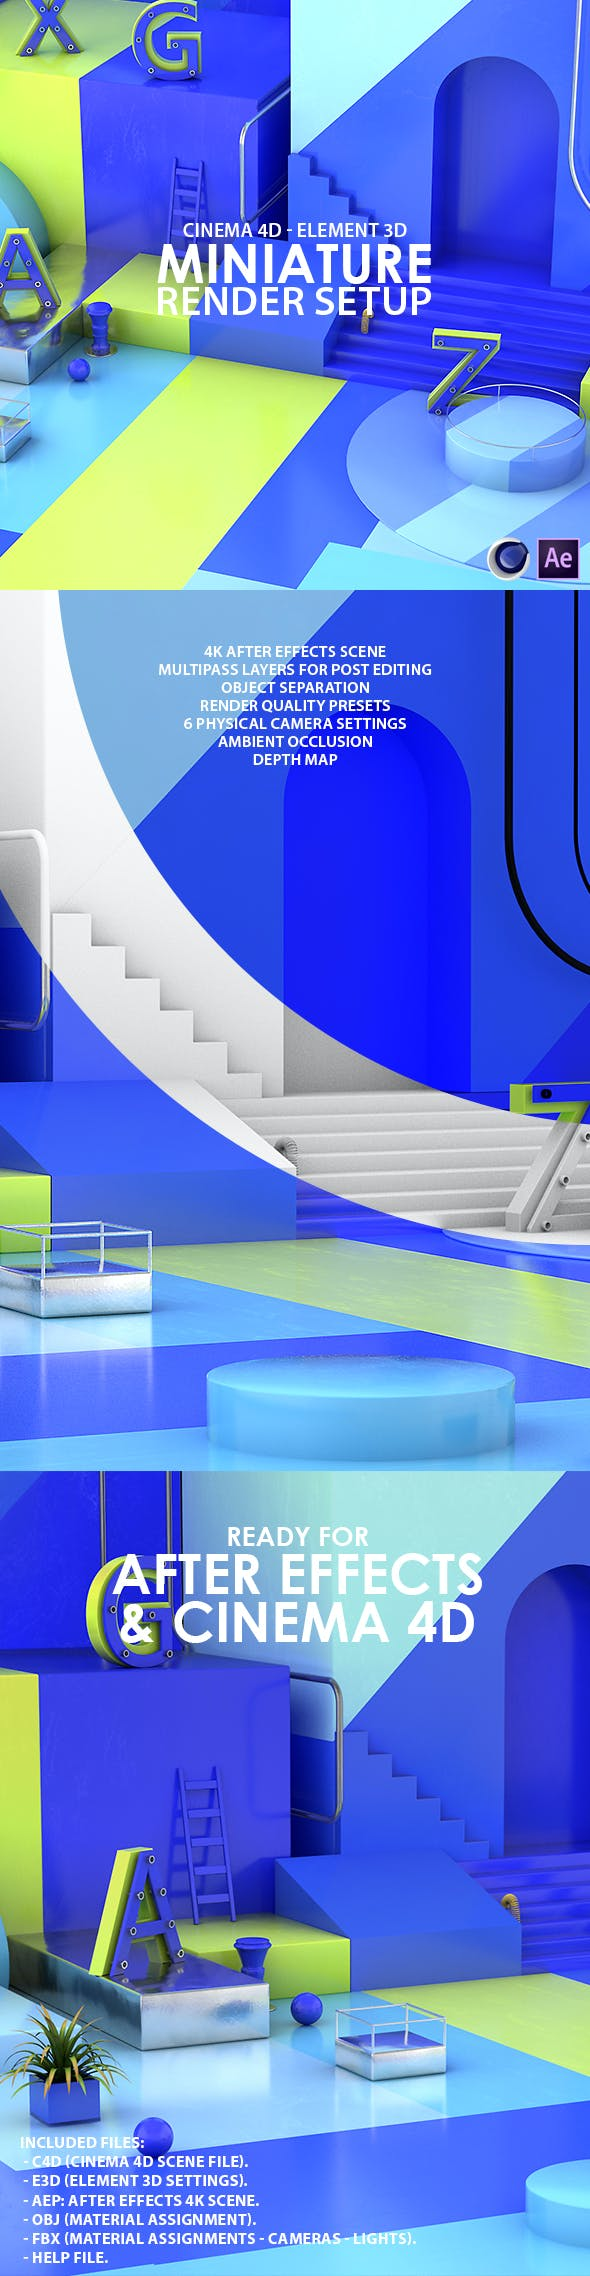 Miniature Render Setup Cinema 4D & Element 3D - 3DOcean Item for Sale